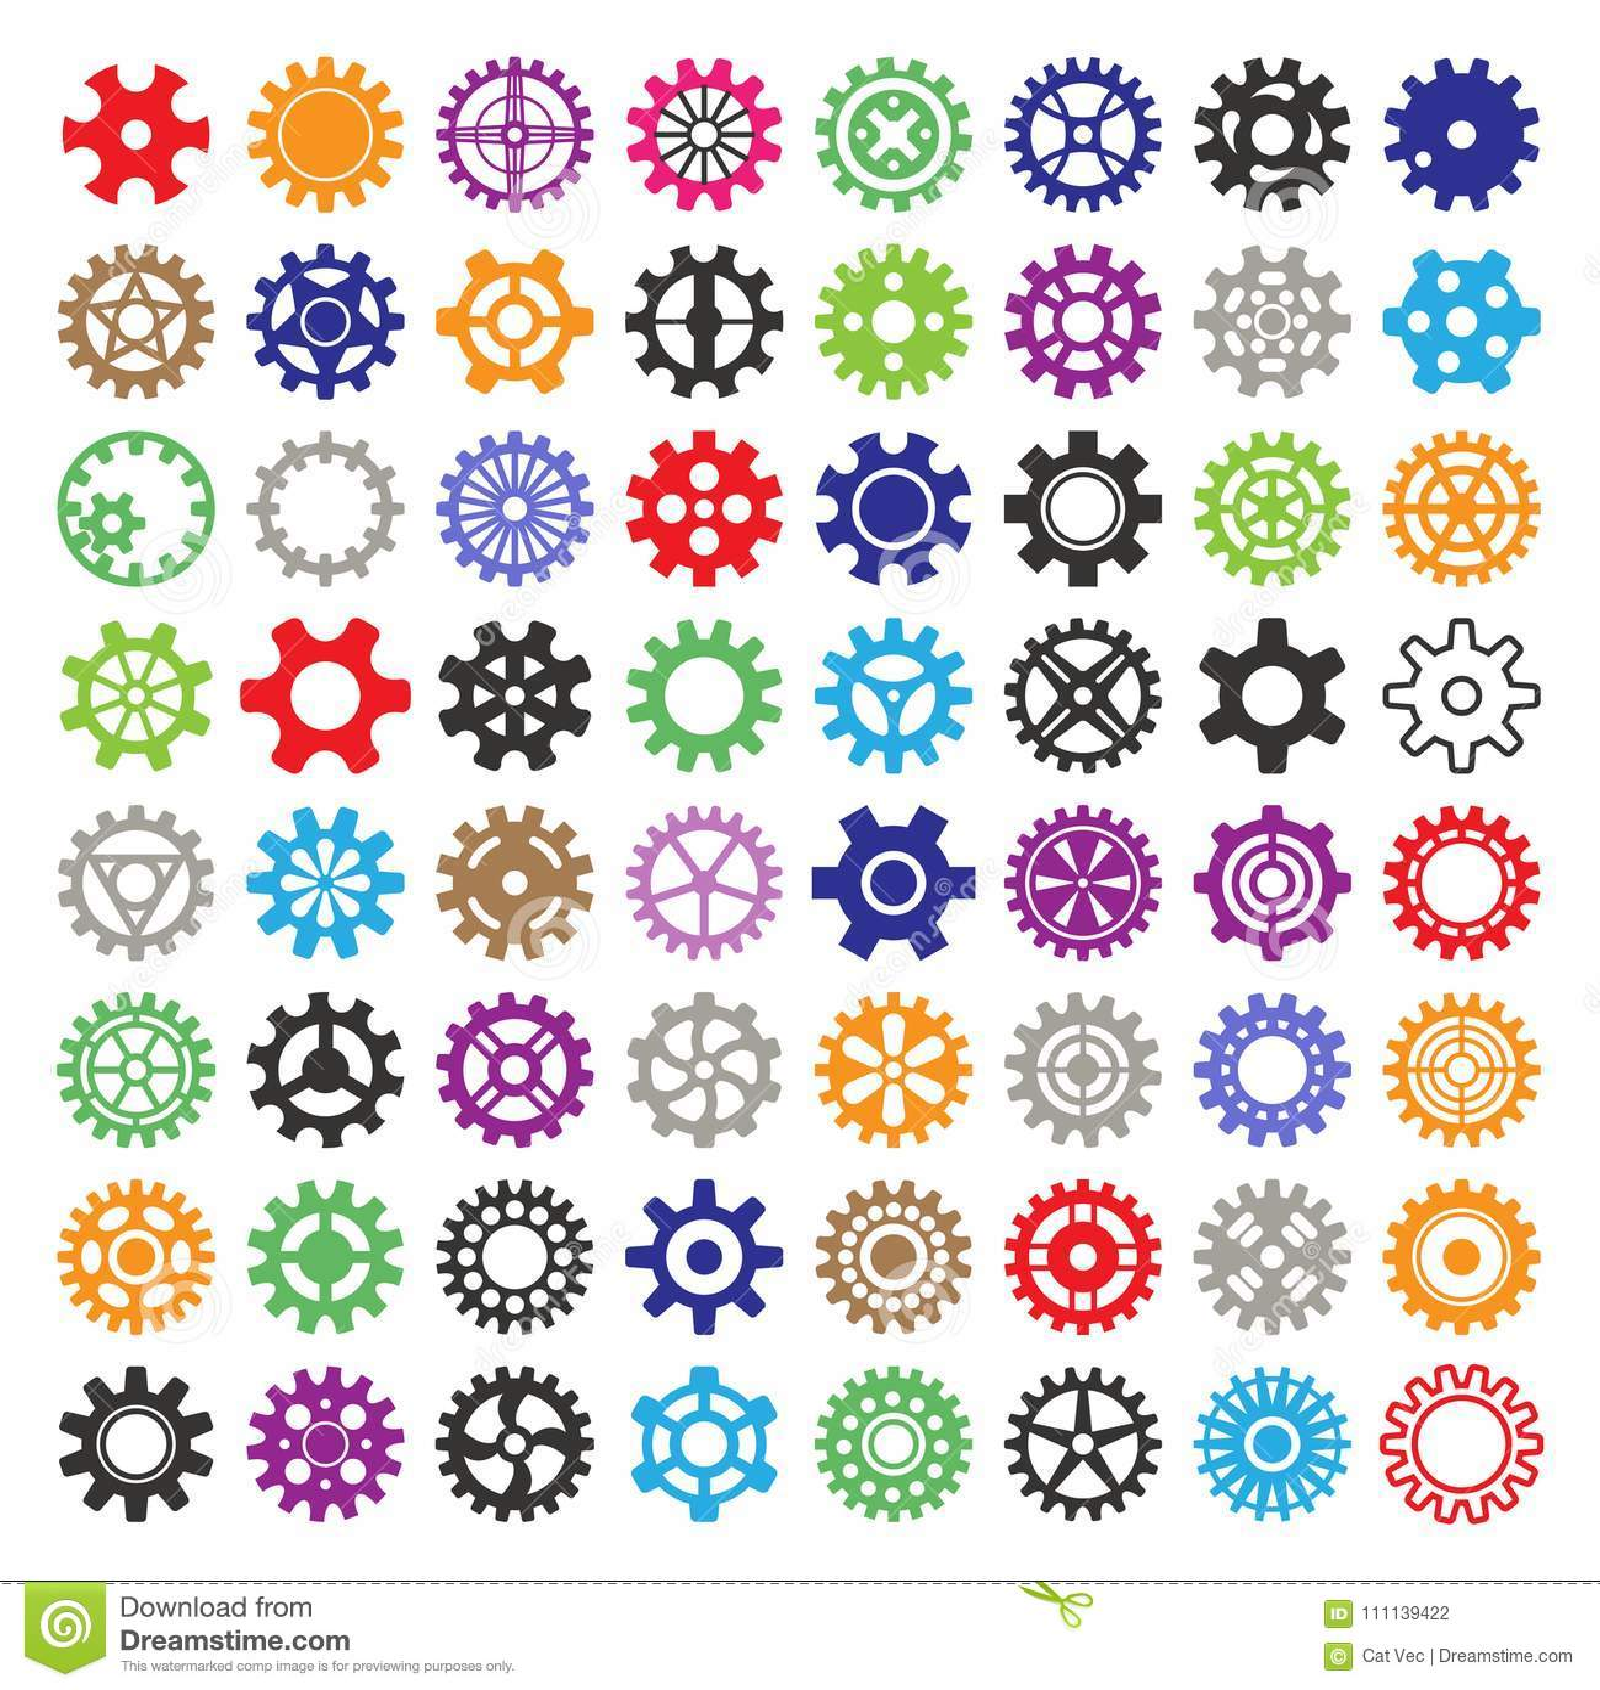 Gear vector mechanism icons isolated illustration. Mechanics web development shape work cog multicolor gear sign. Engine